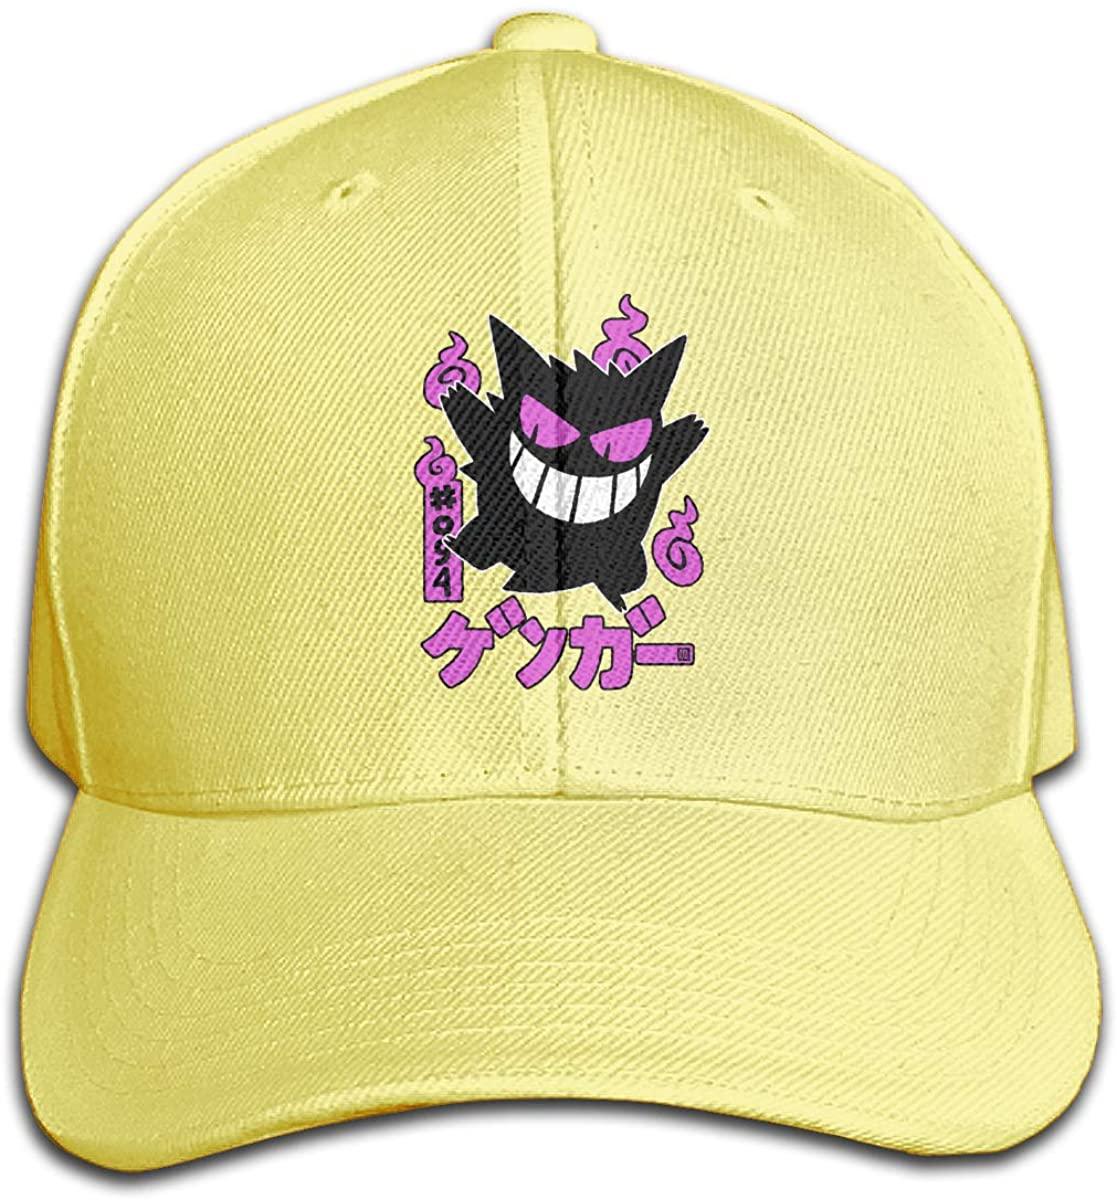 Qbeir Adult Shiny Gengar Cowboy Hat